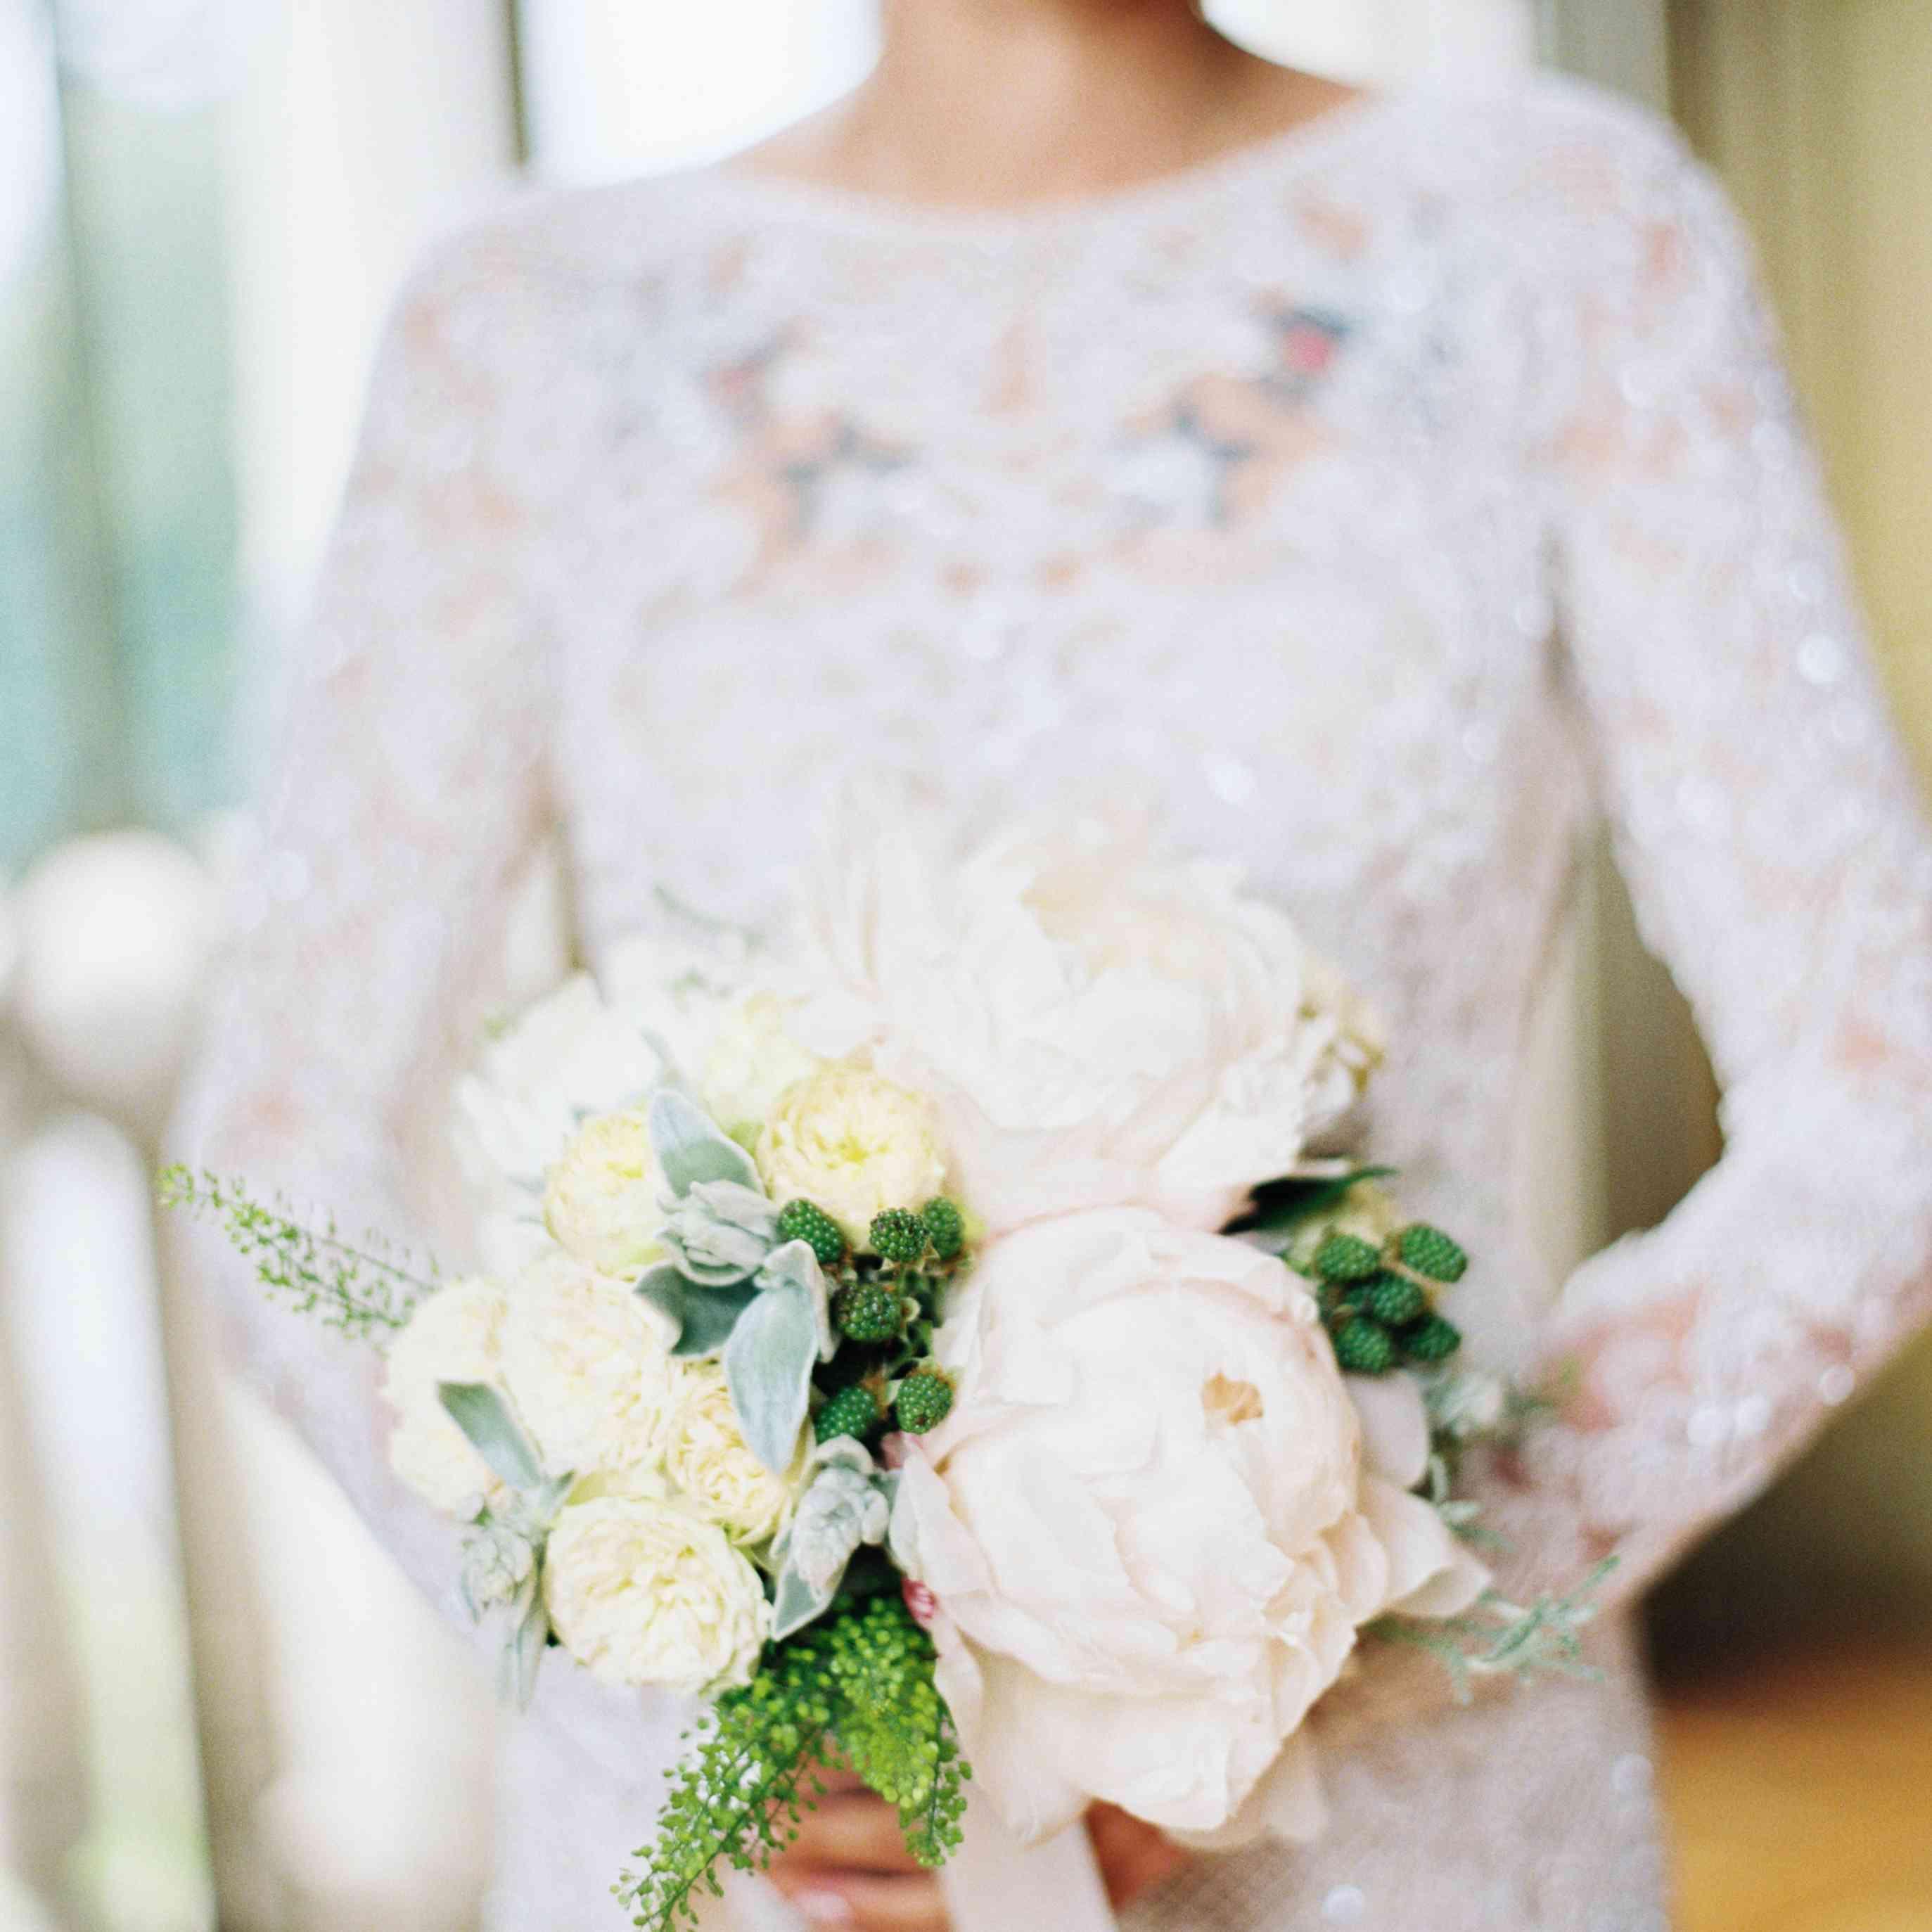 Northern Italian Wedding, Bridal Bouquet